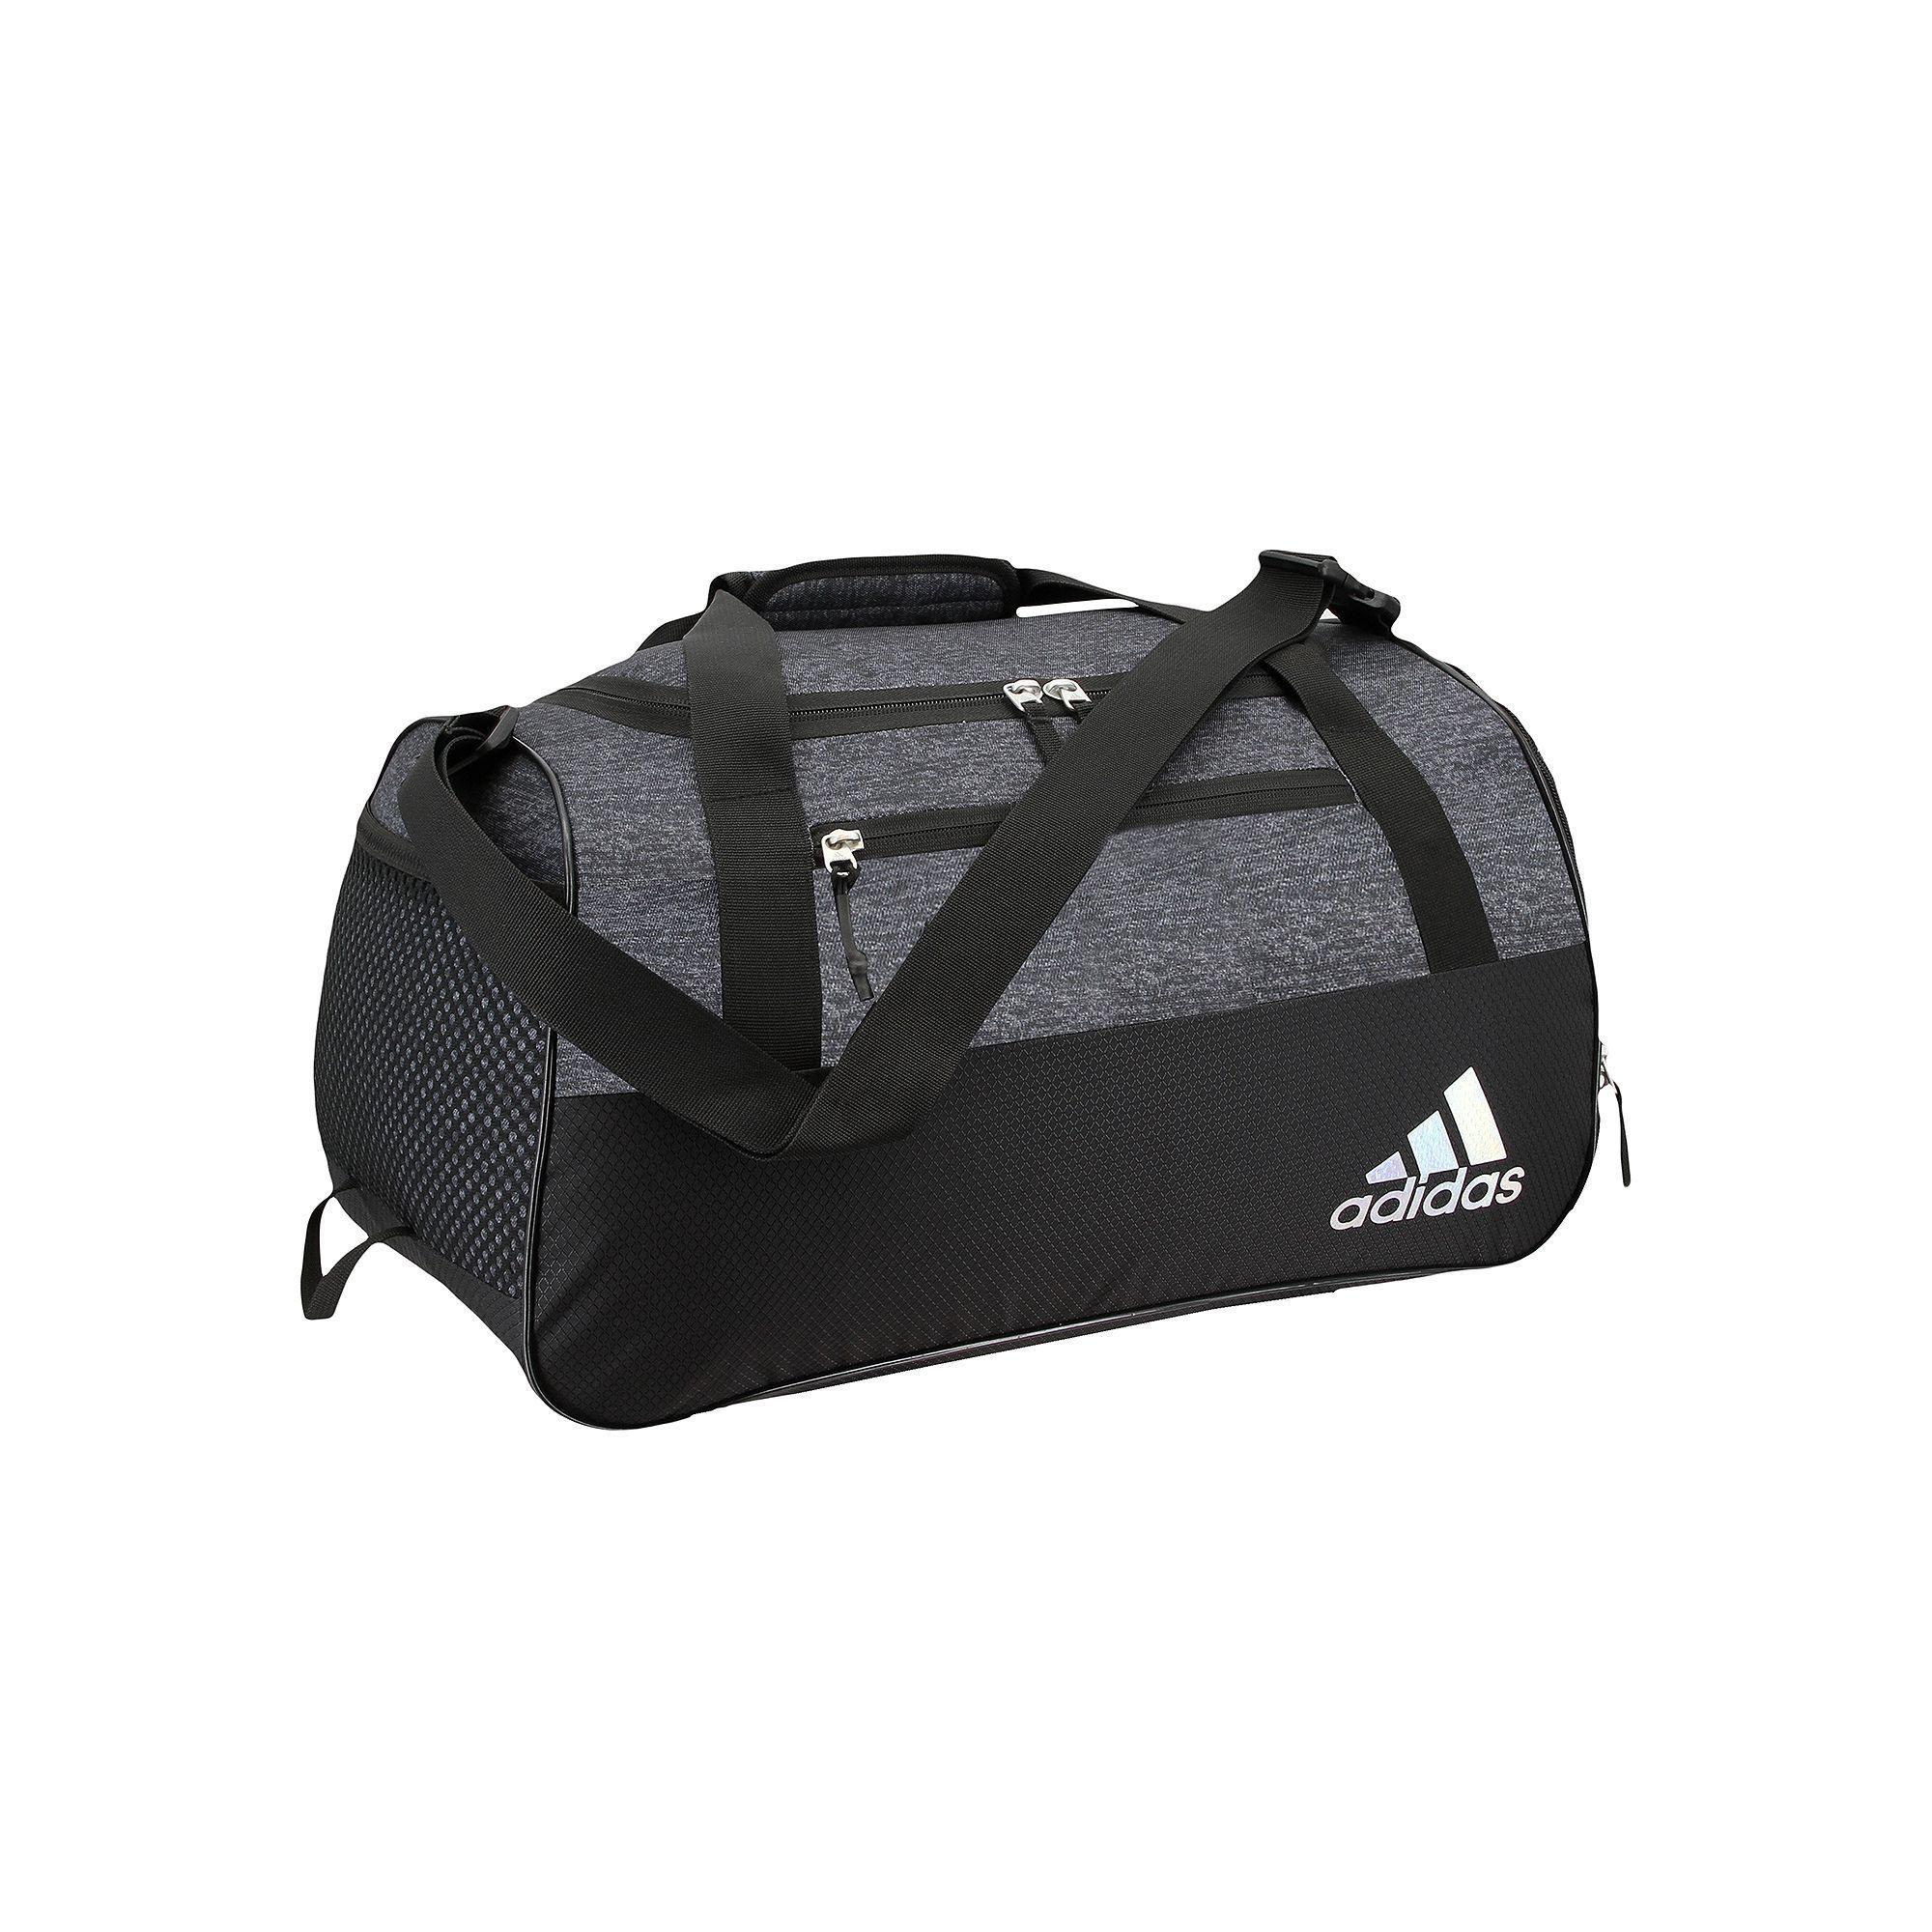 adidas Squad III Duffel Bag  3ebab30912